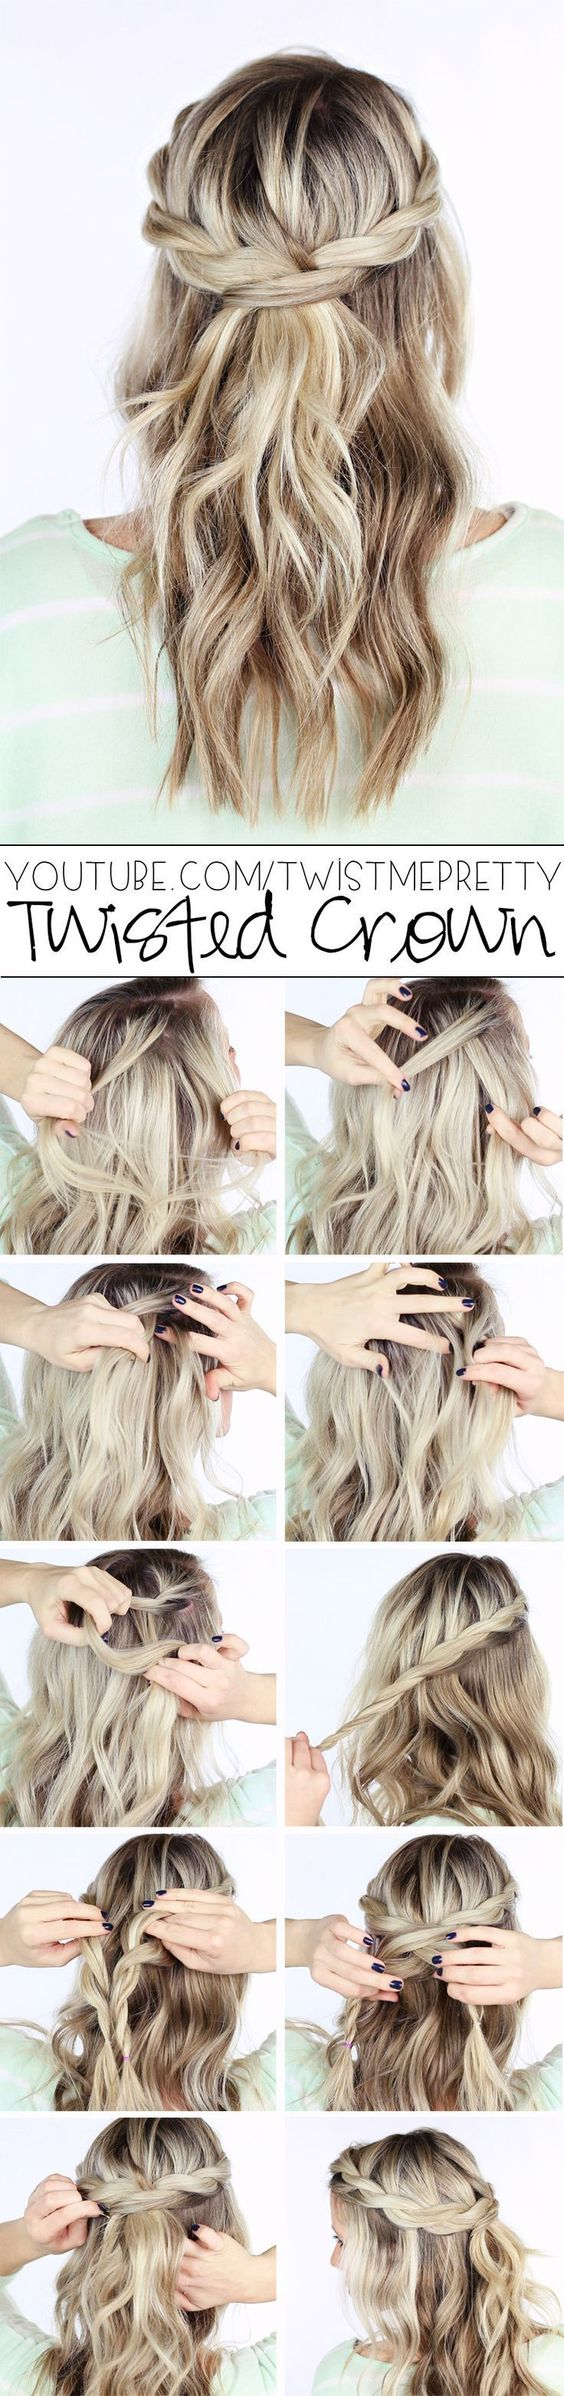 best 25+ down hairstyles ideas on pinterest | half up hairstyles